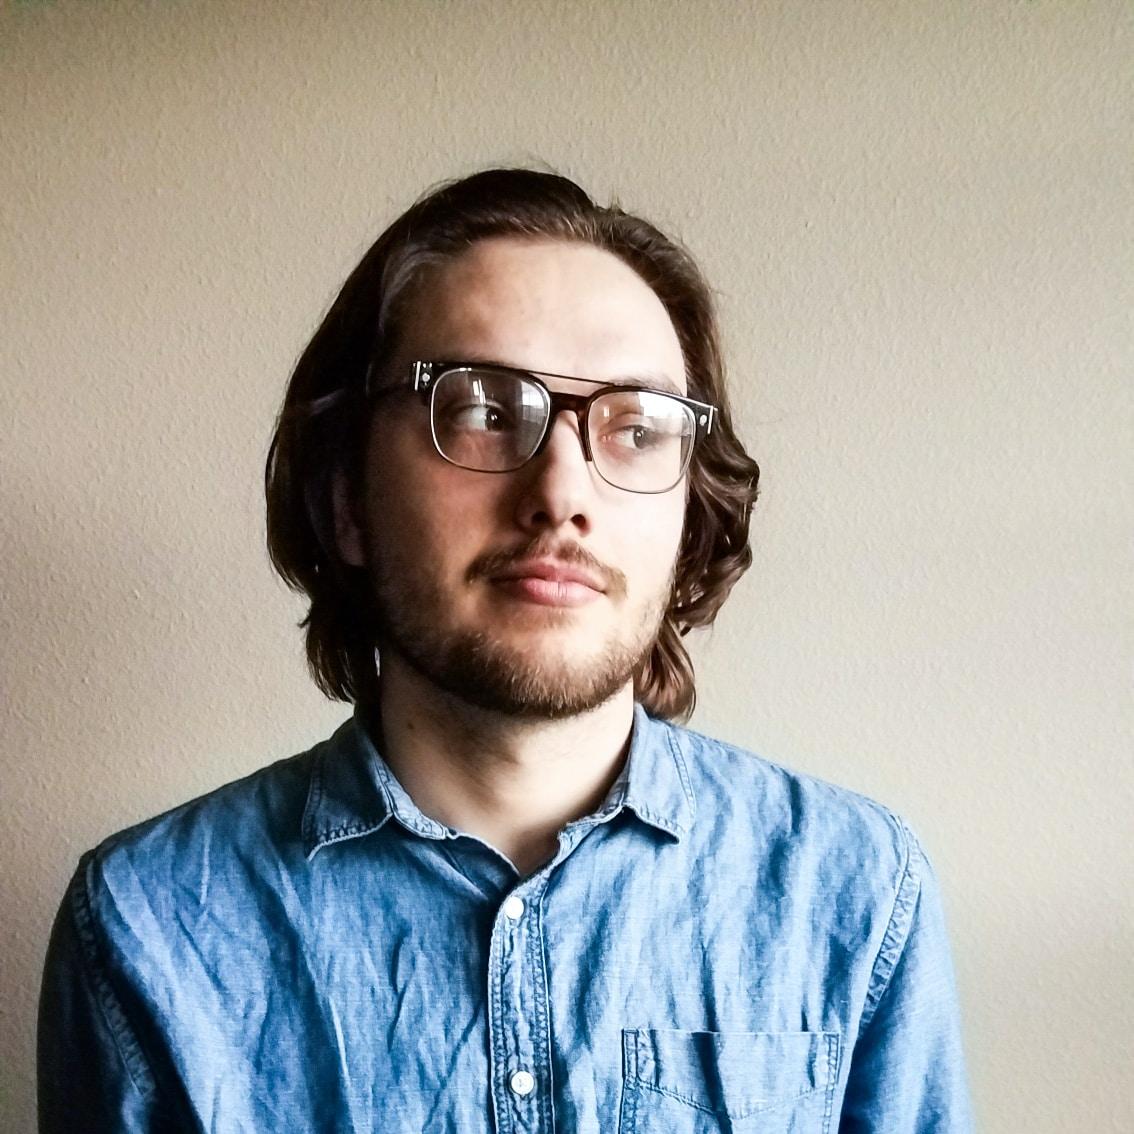 Go to Jake Schaffer's profile